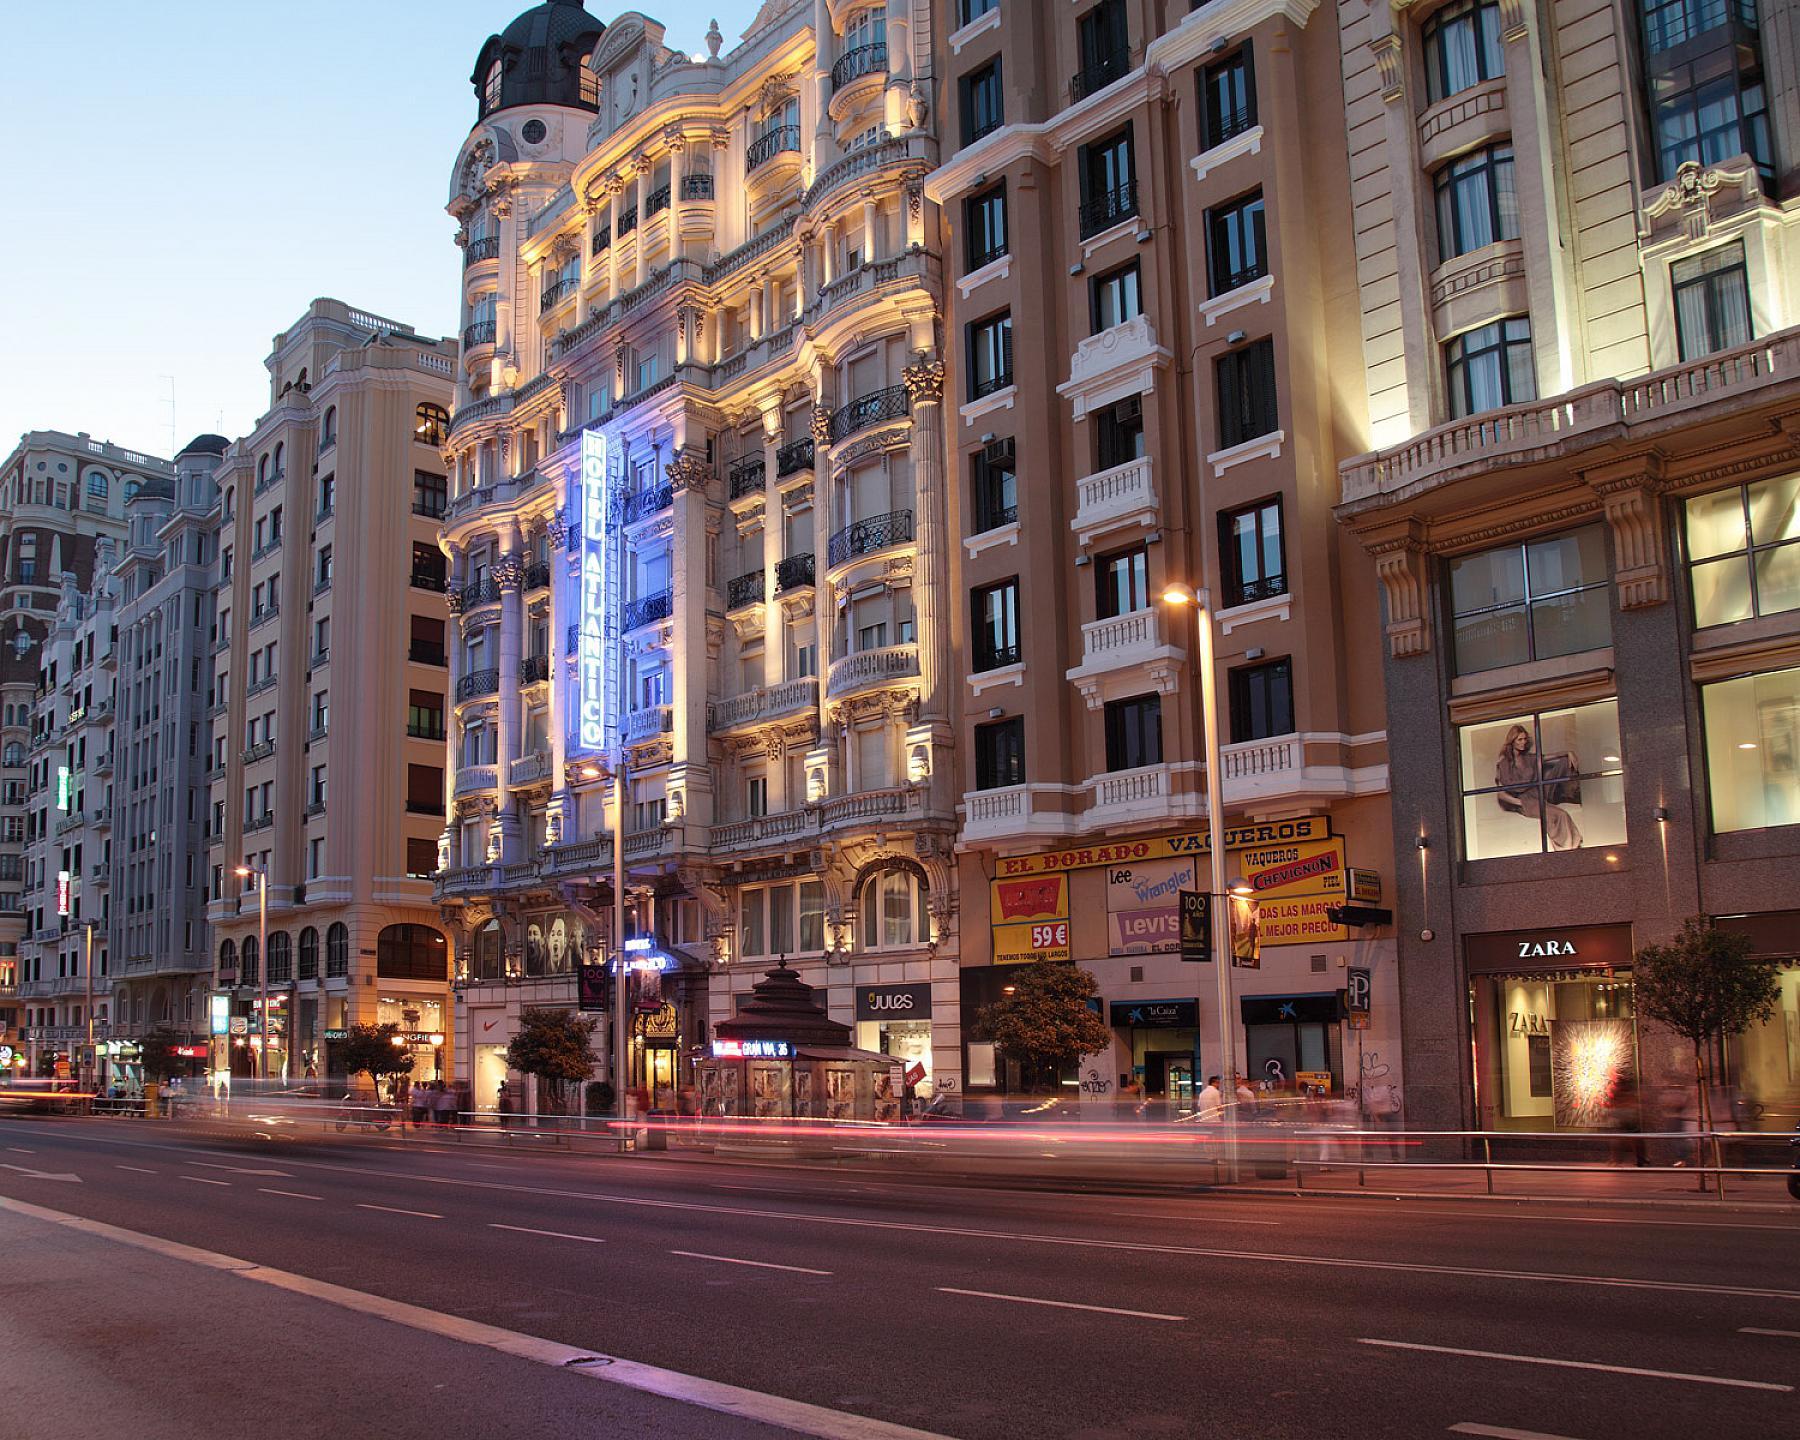 4bcb18ba44f80 100 years old Luxury hotel in Gran Via - Hotel Atlantico      Madrid